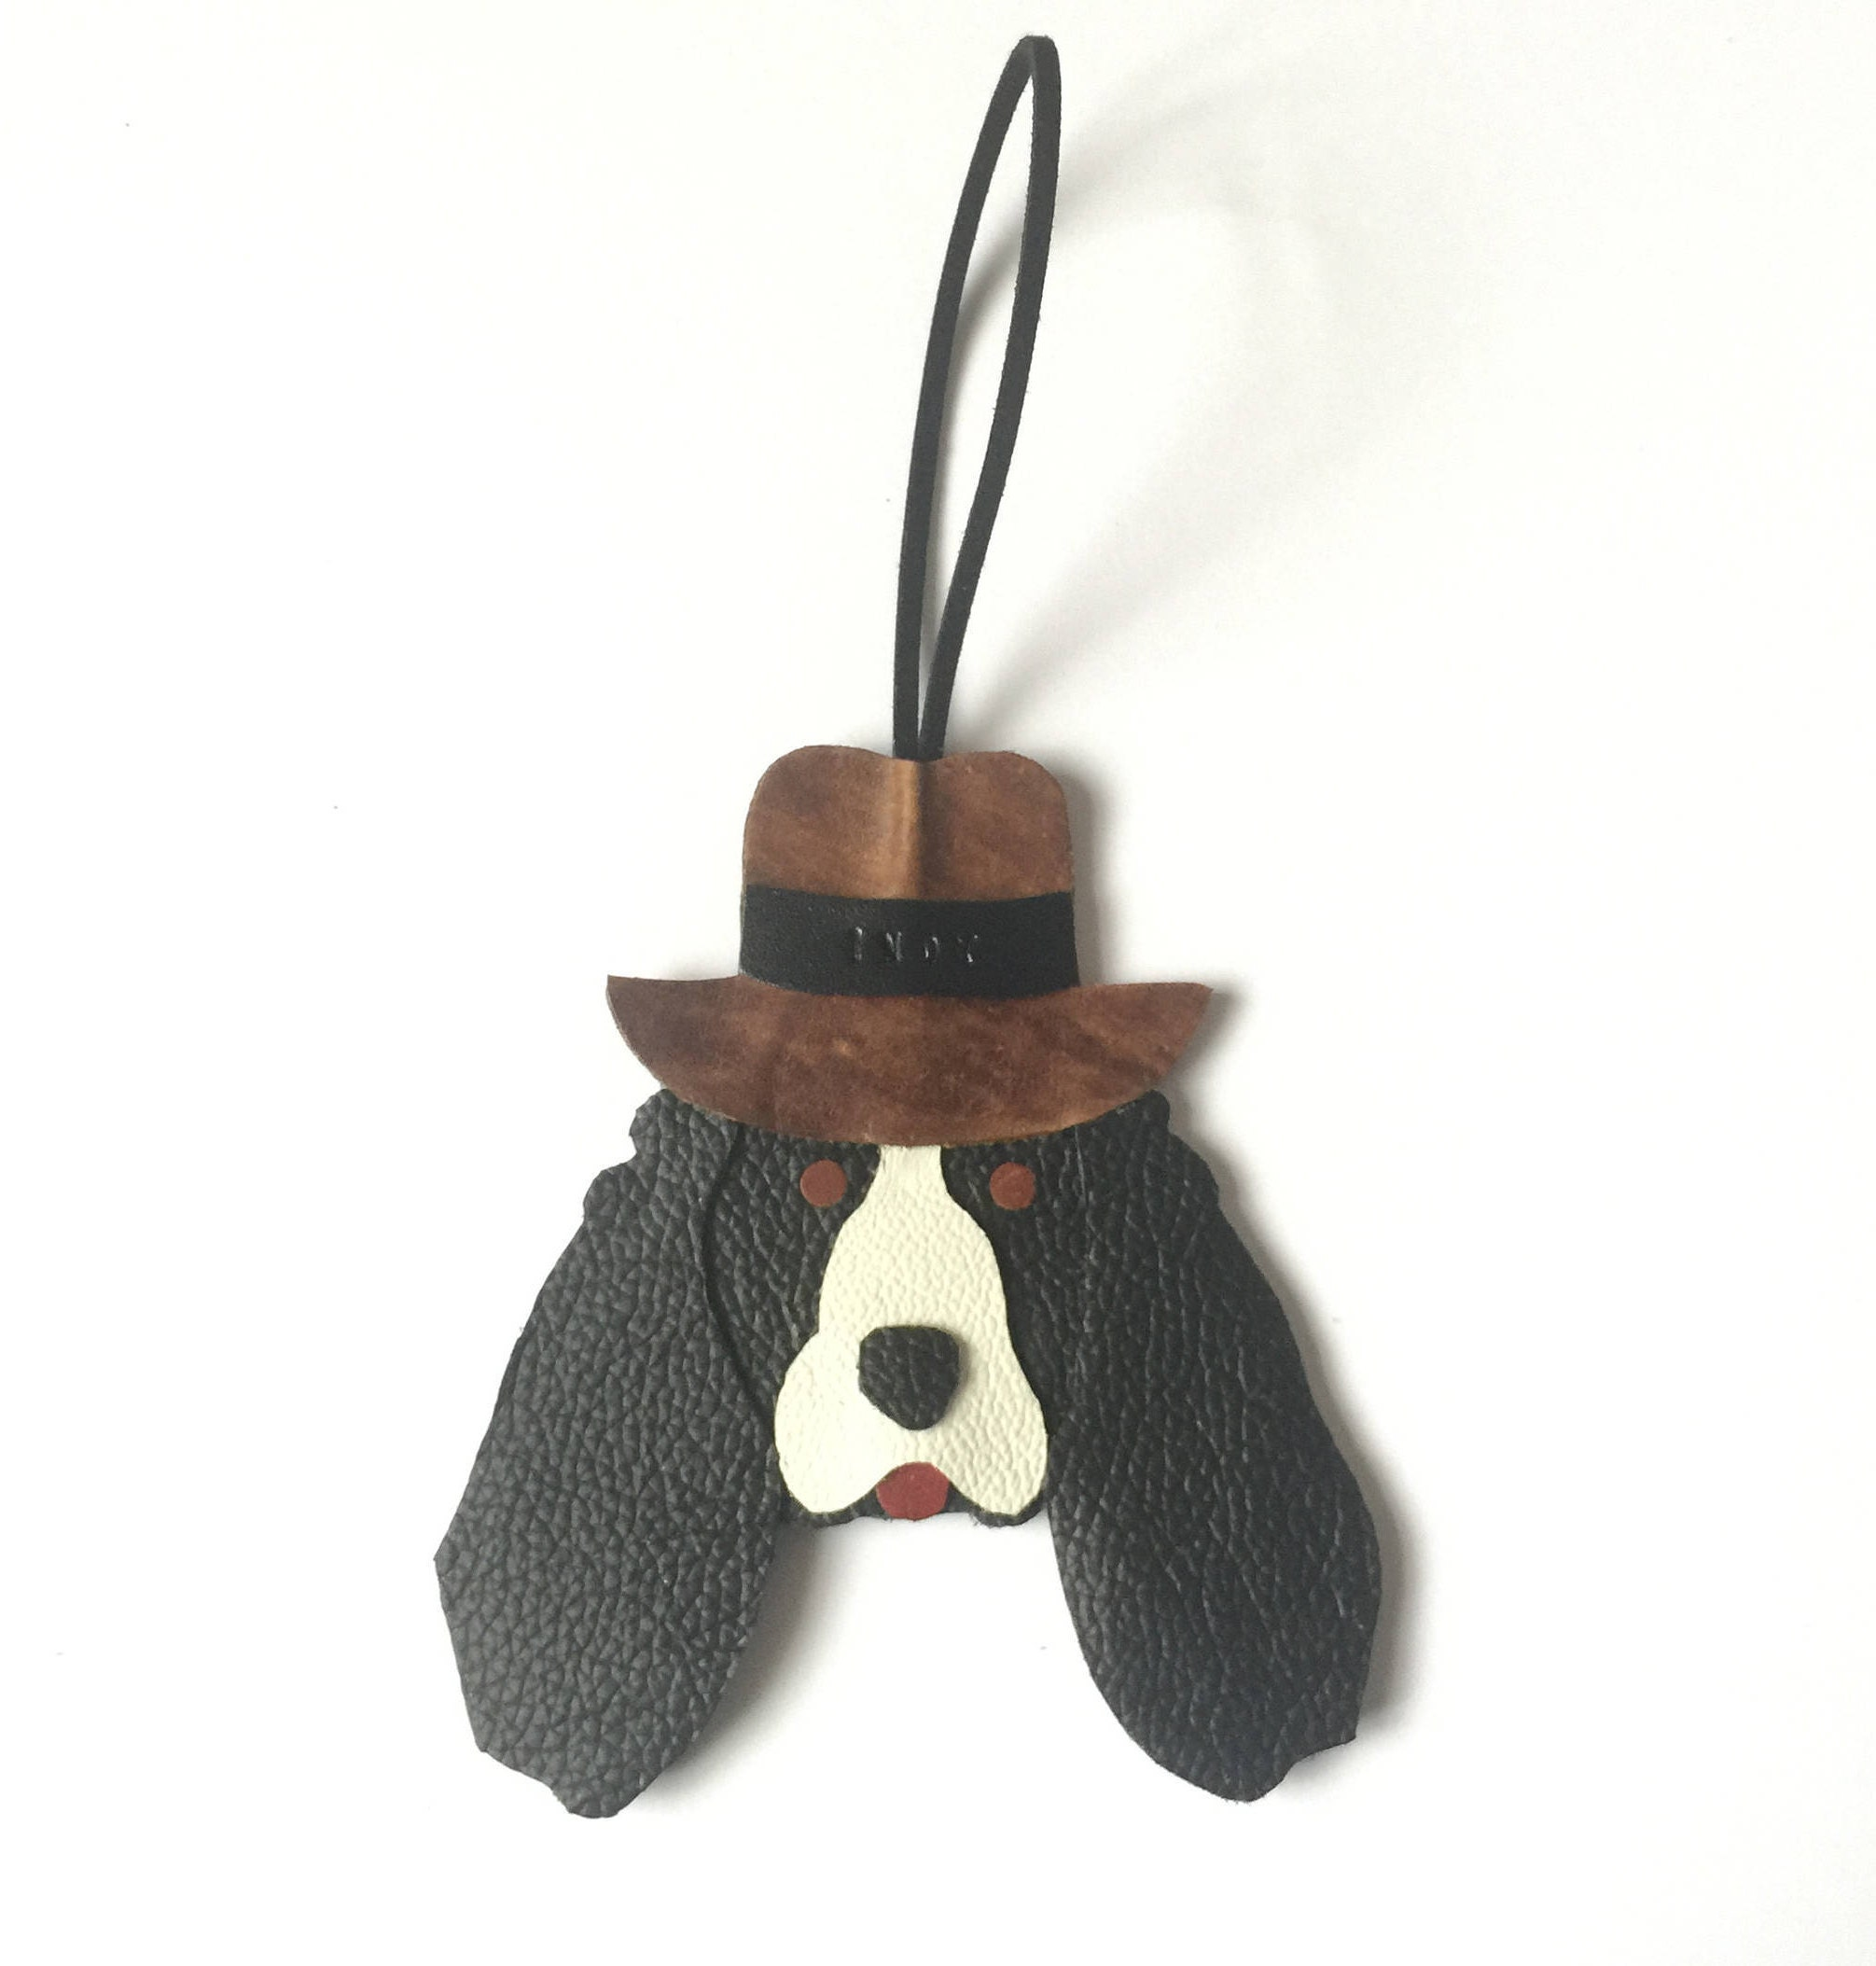 Springer Spaniel Ornament Personalised Leather Fedora Hat Handmade 9580d0156da